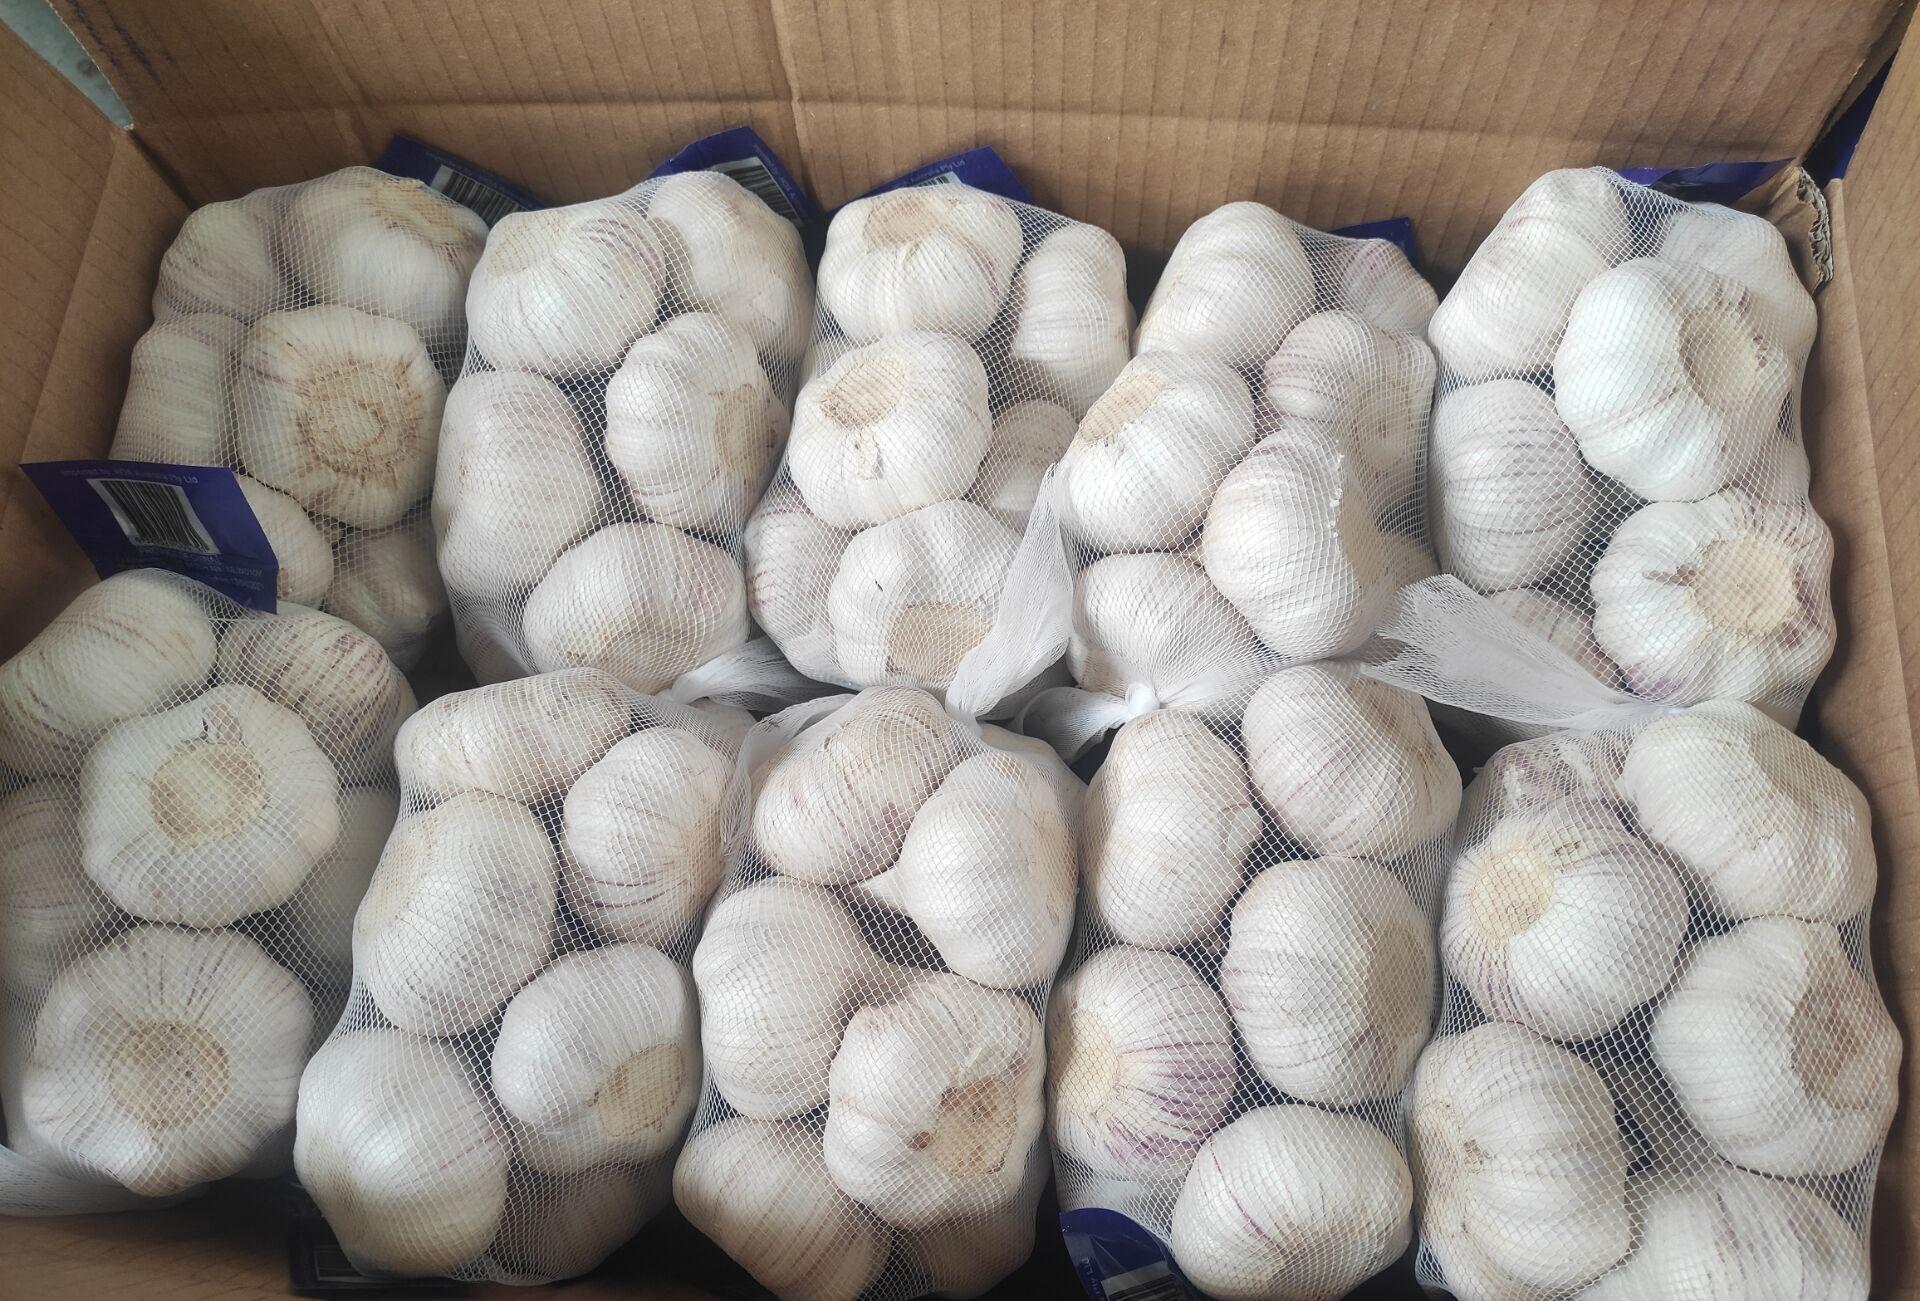 China Fresh Common Garlic - China_Garlic_5.jpg